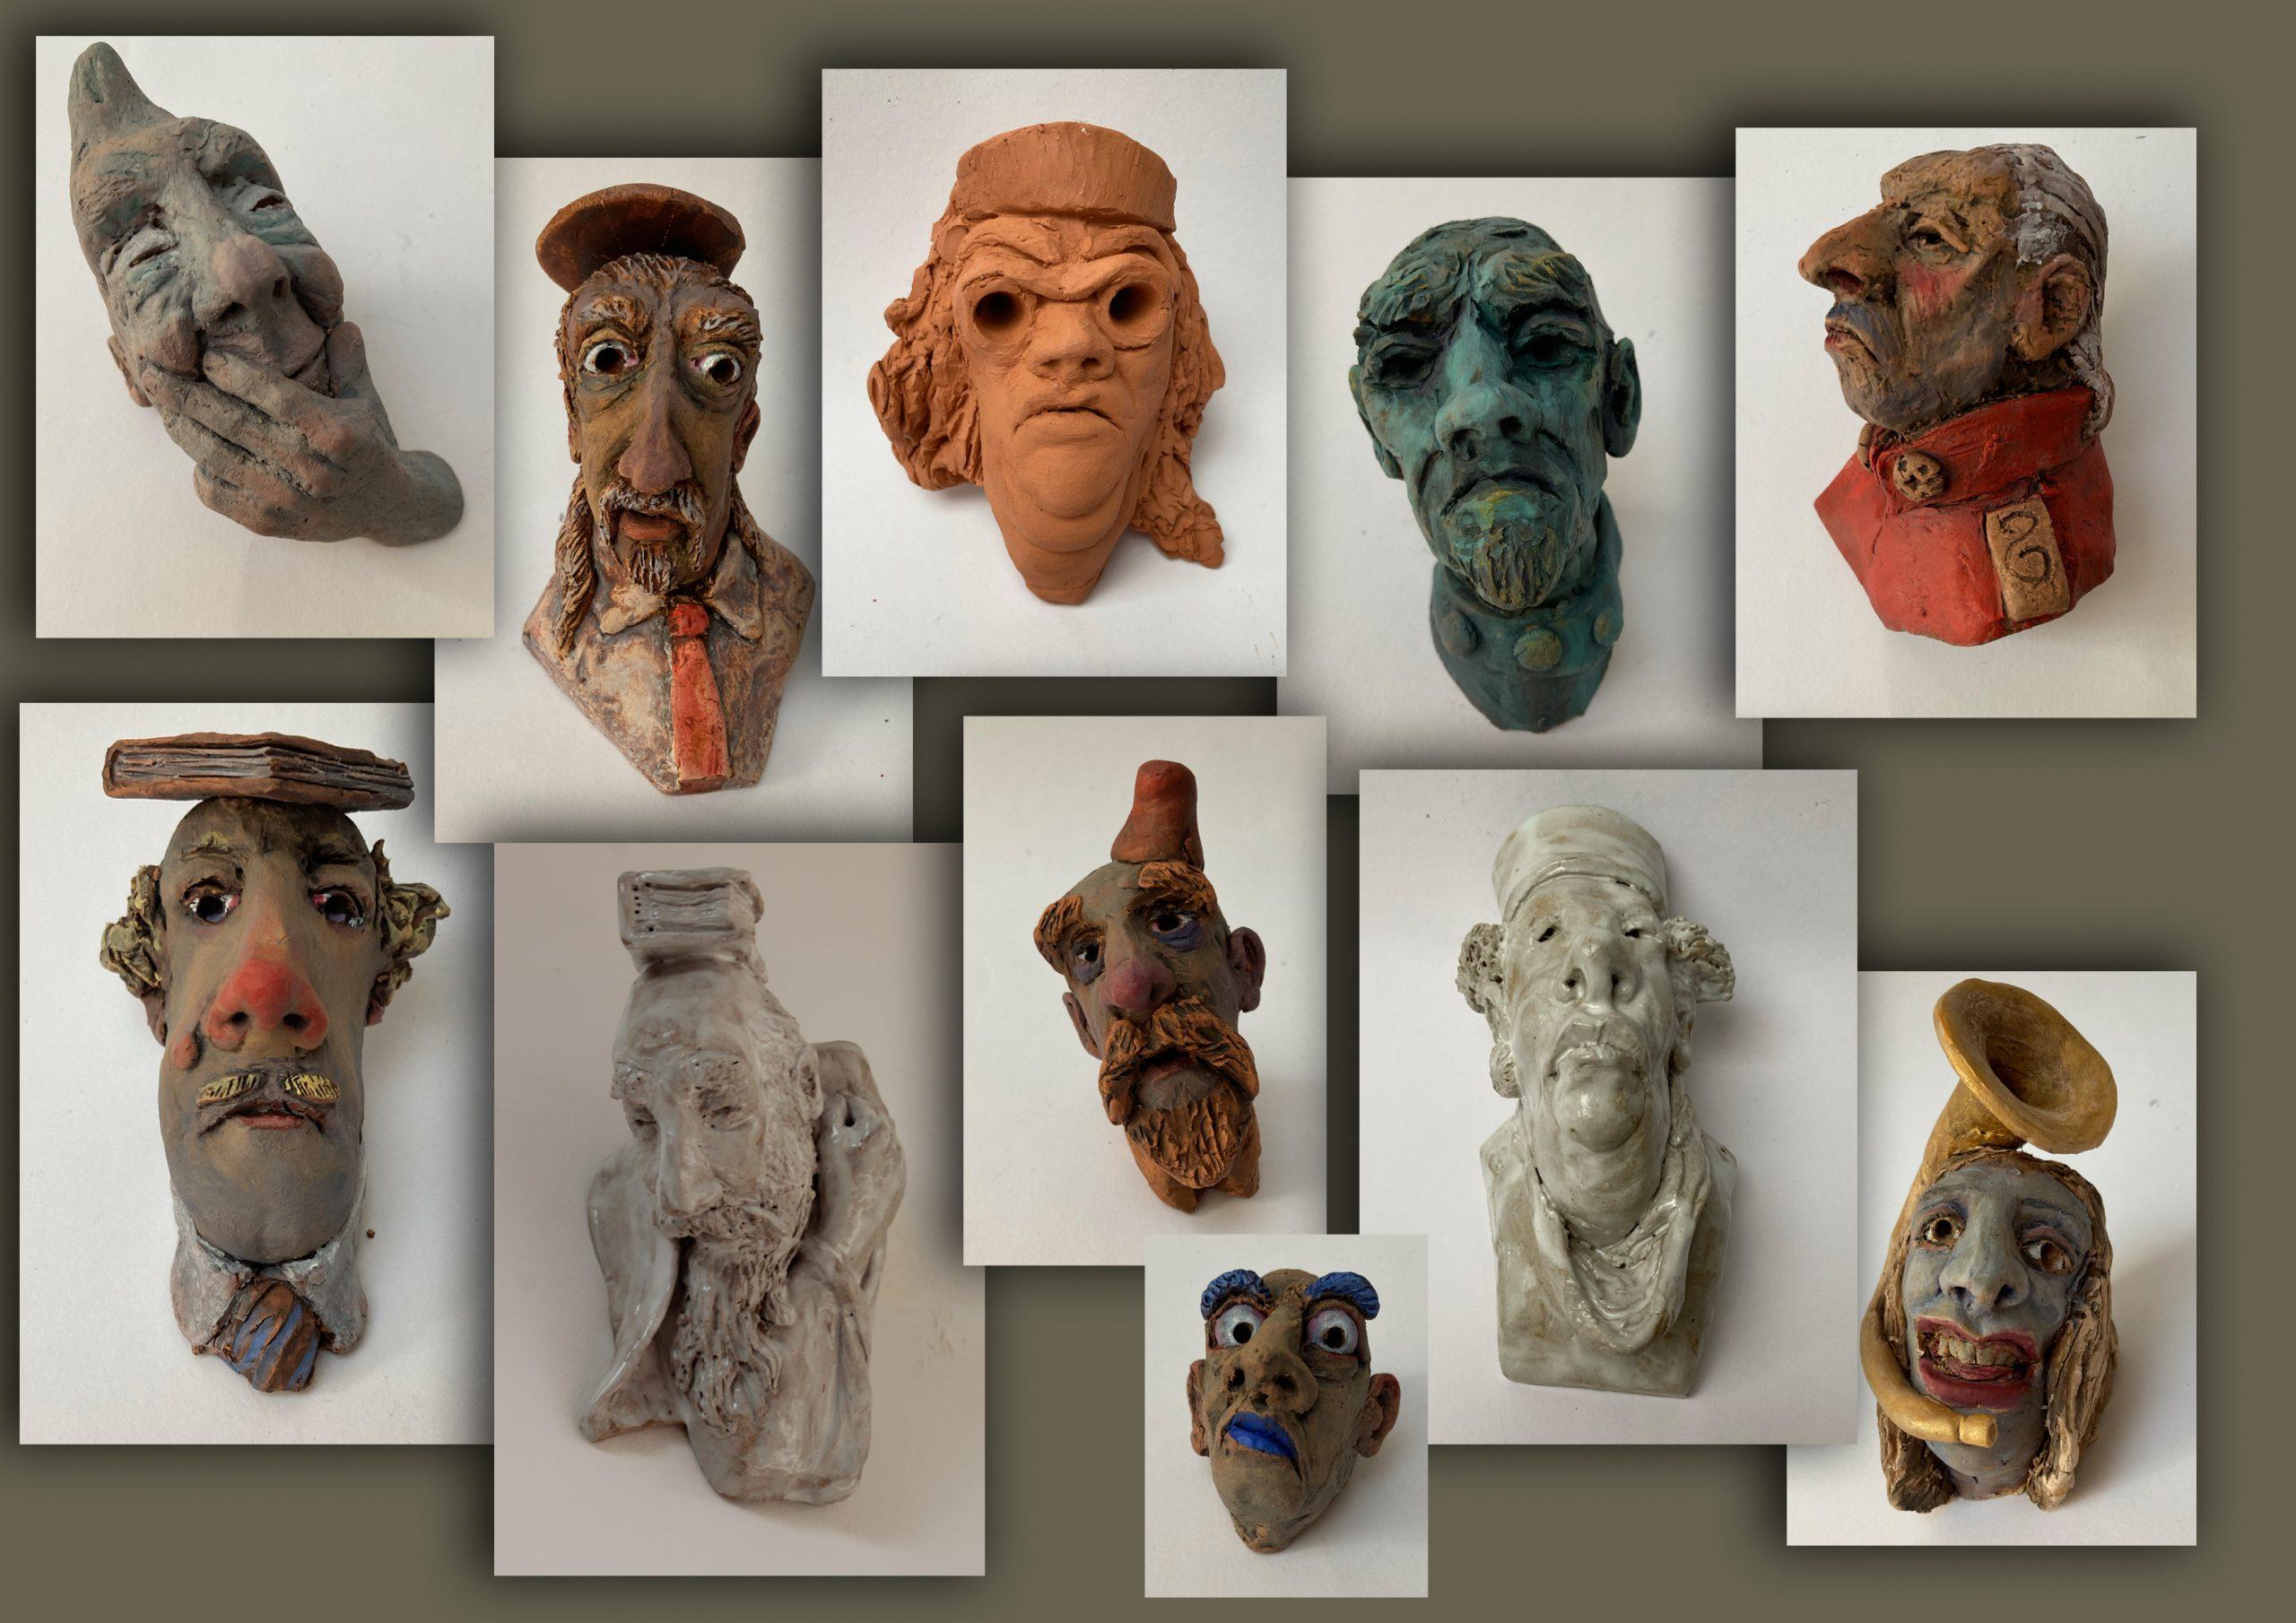 Gallery of Mind Gargoyles artwork